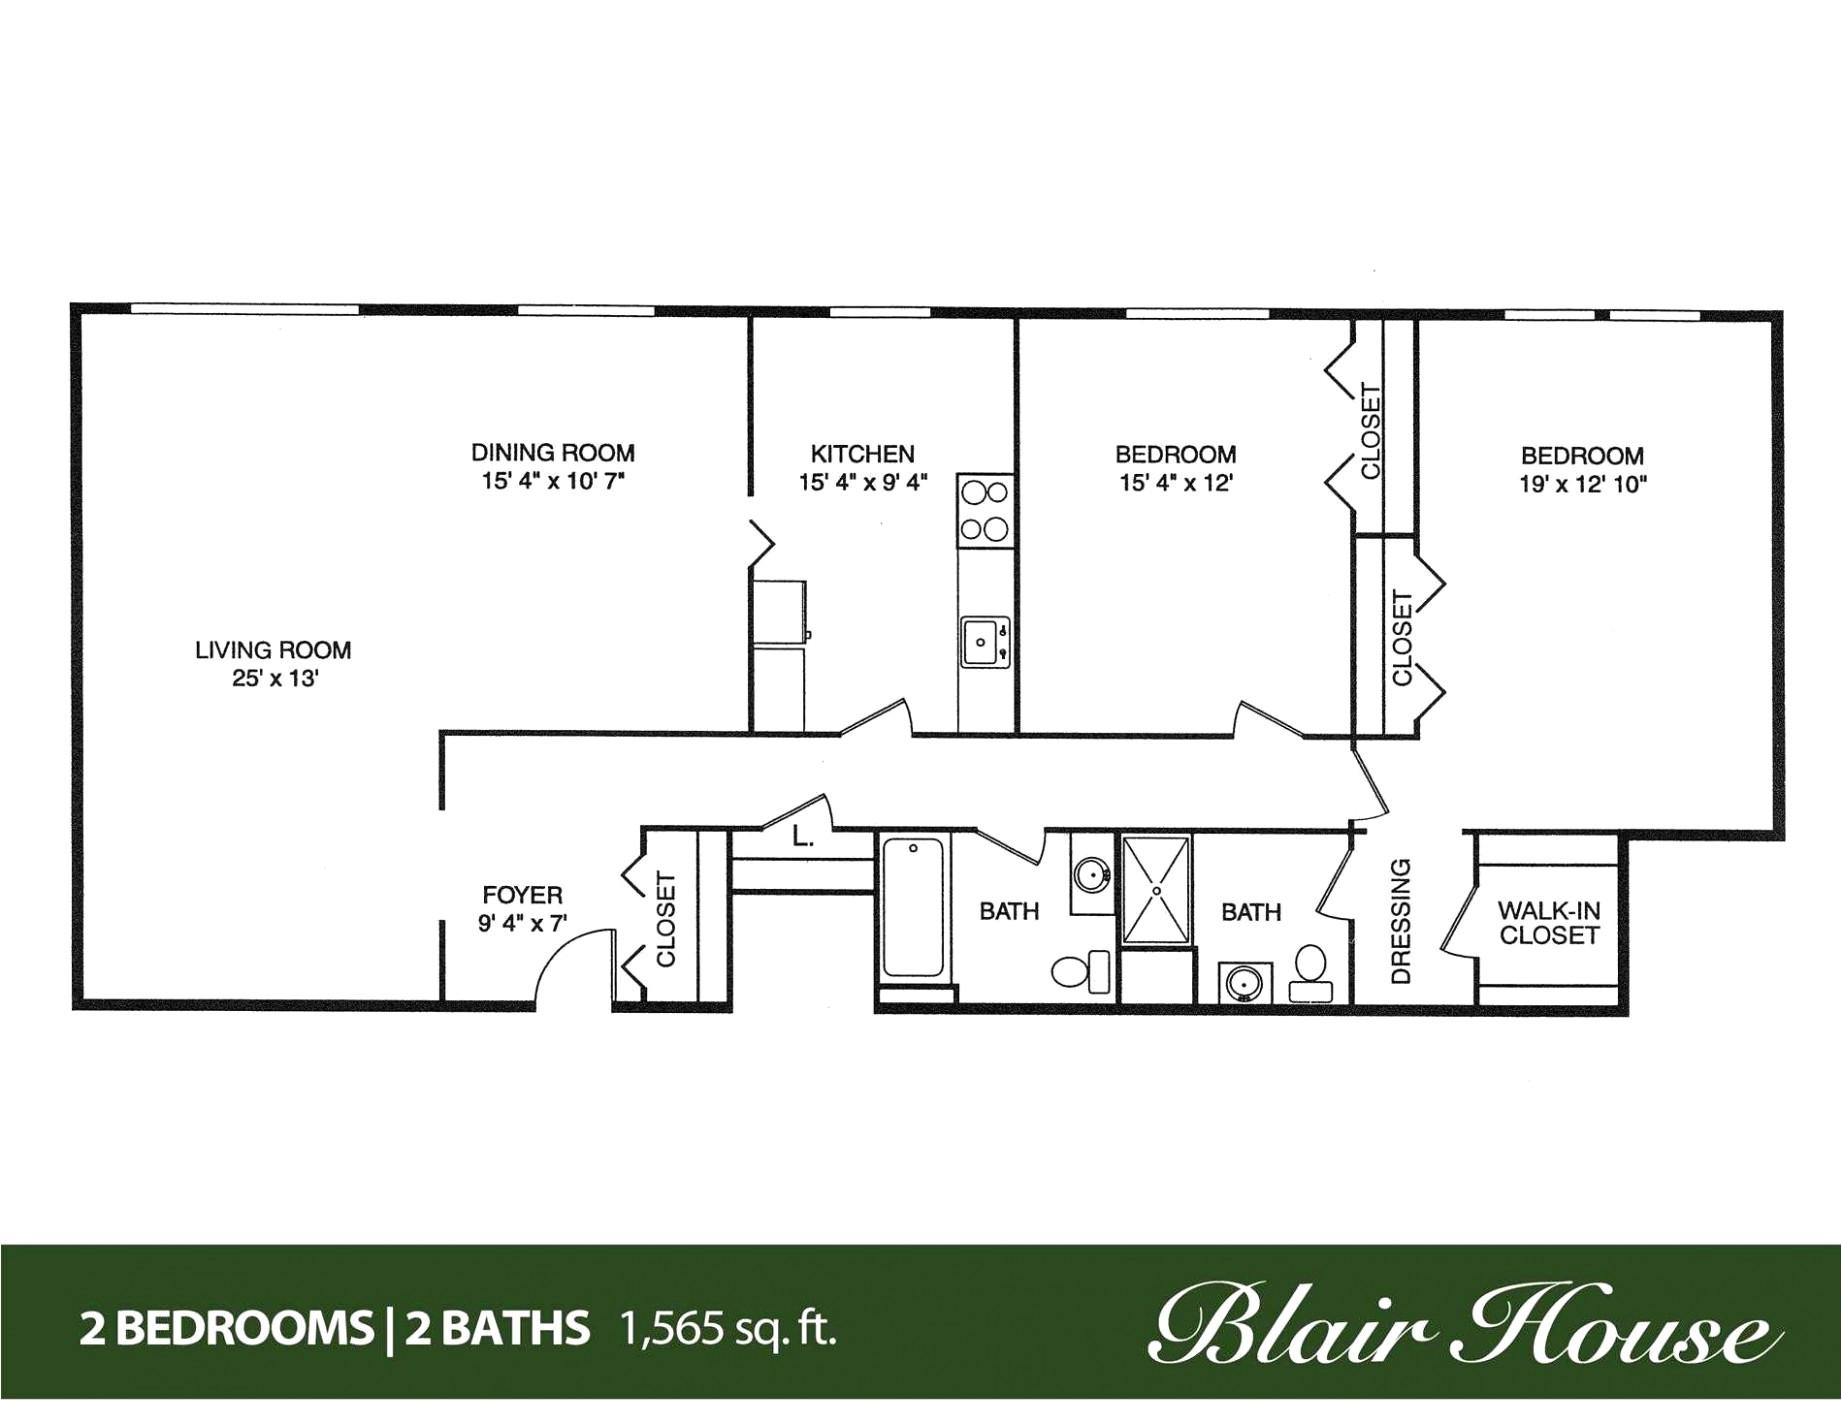 hubbell homes floor plans unique denver floorplan vlnys2yozus9a9u4uh i pyrgtydsj543gzl cbhbcb8